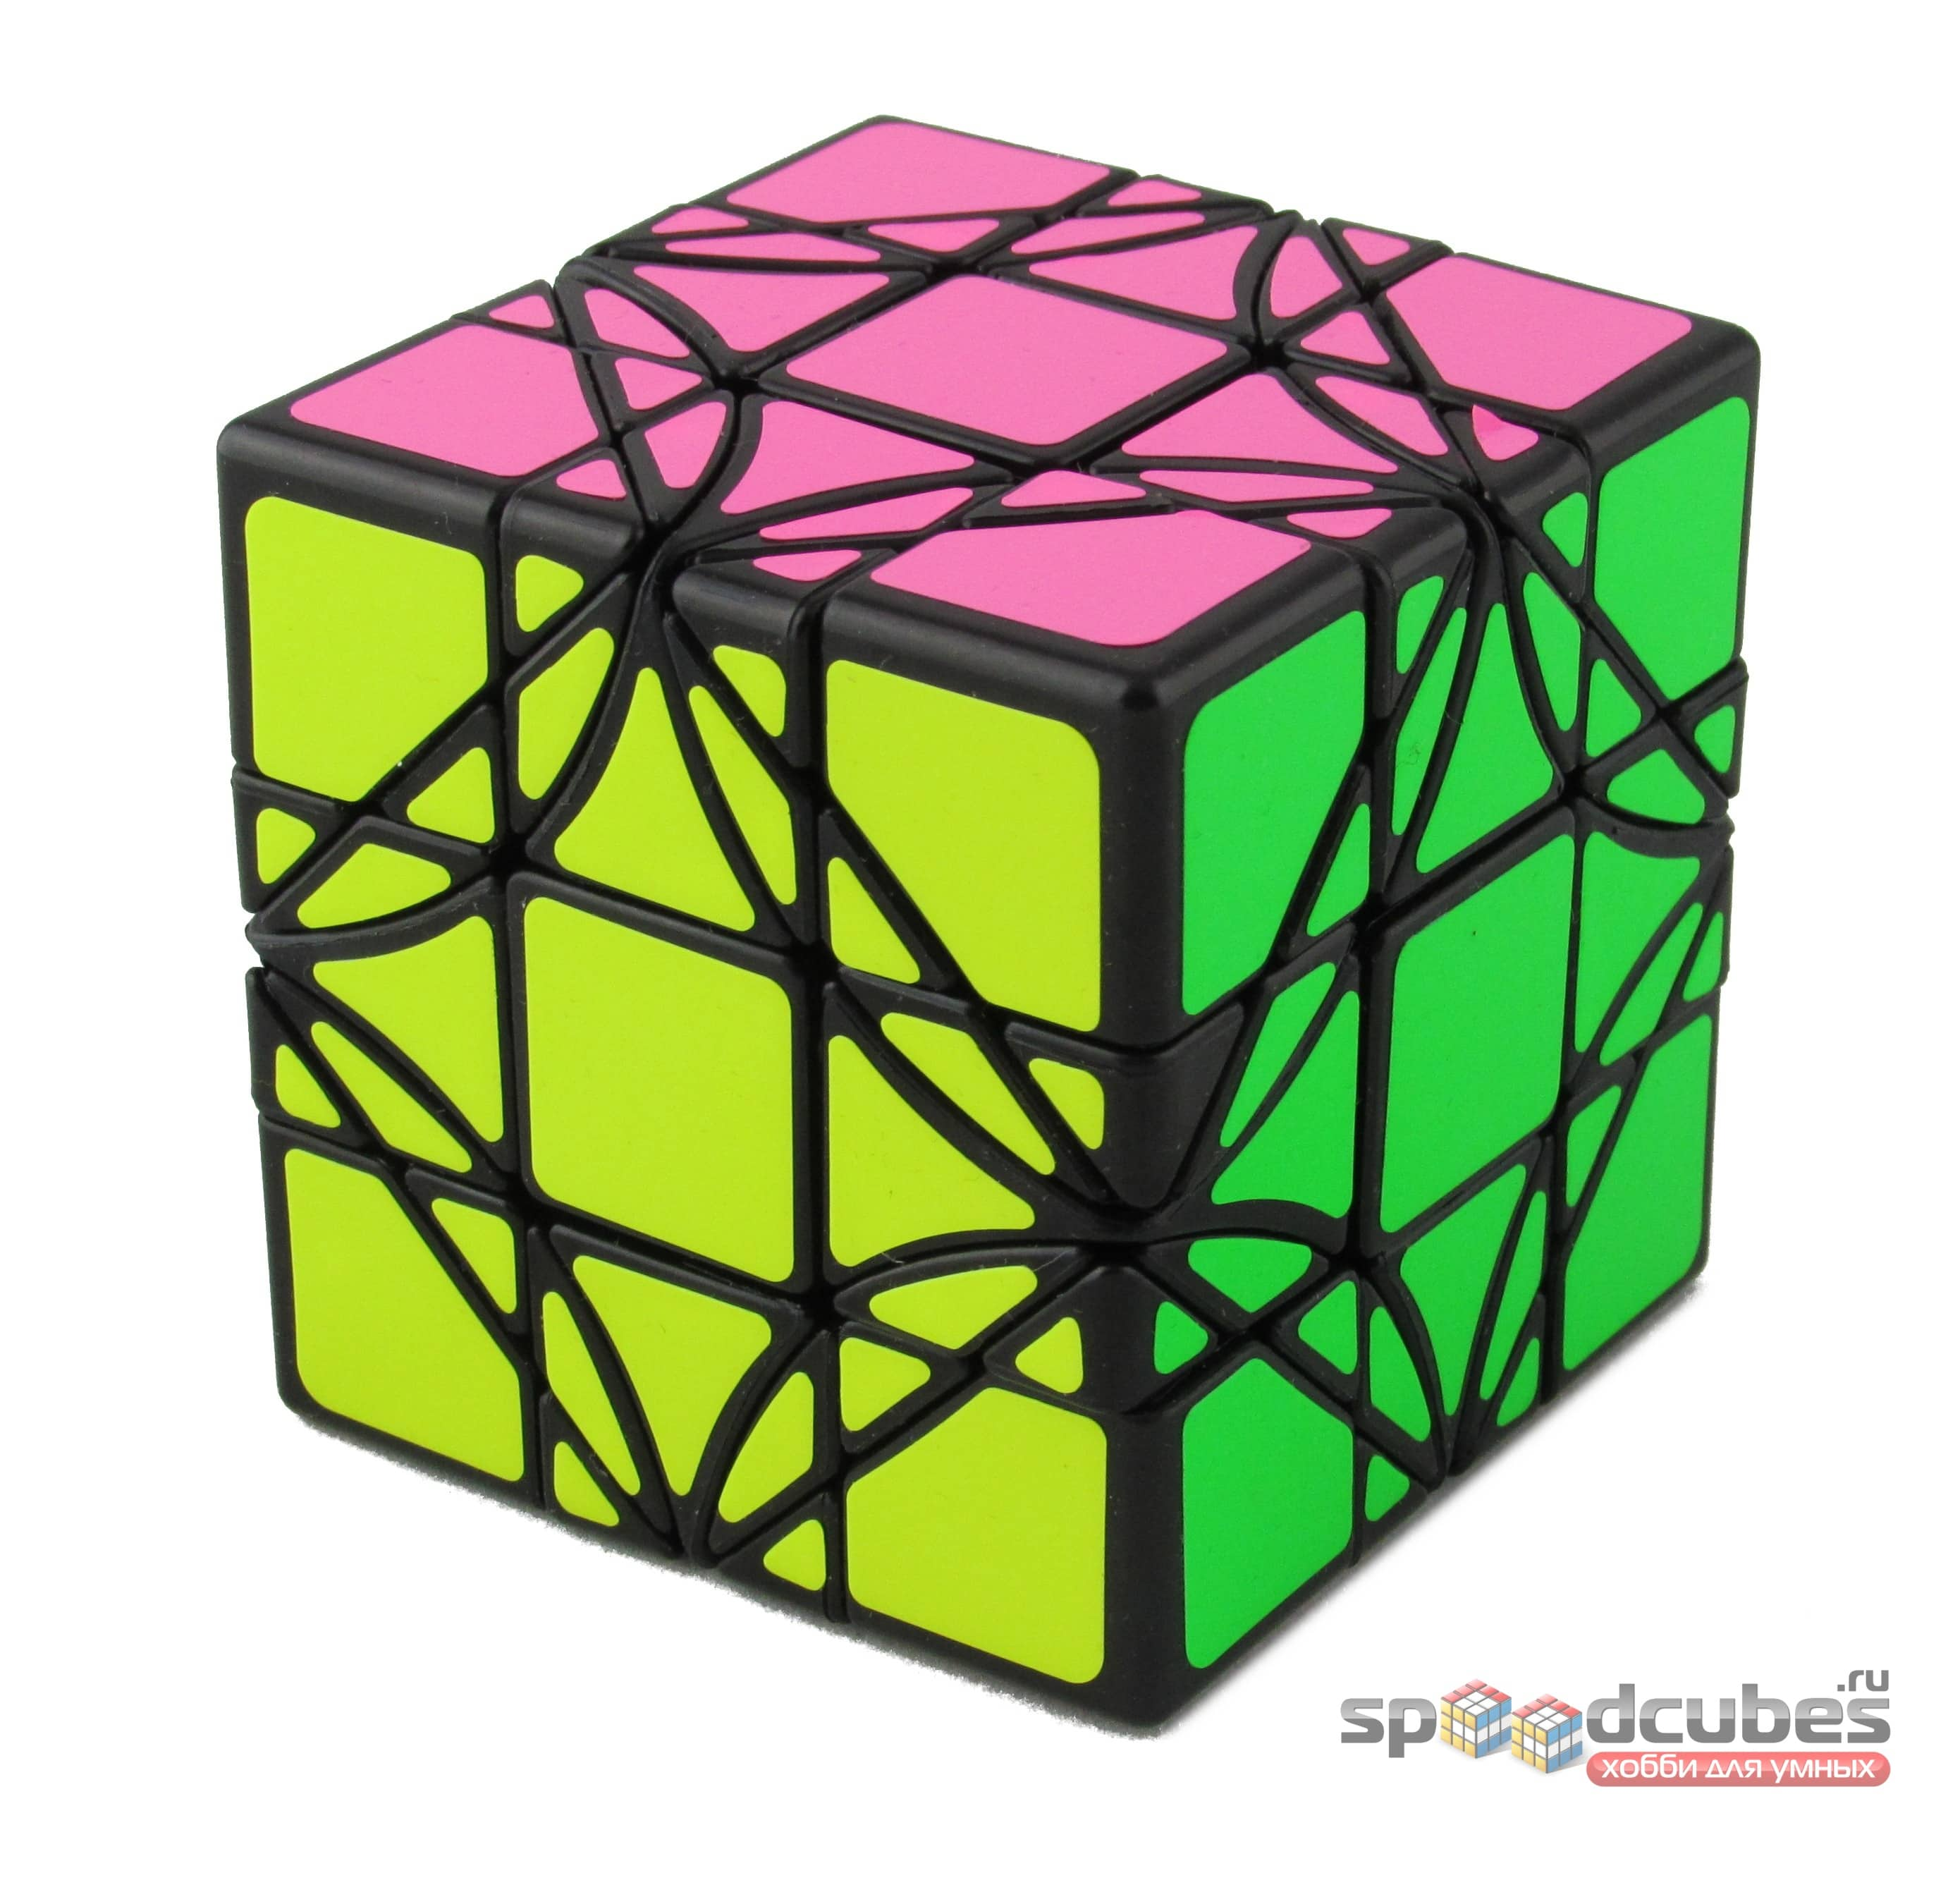 Fangshi Funs Lim Cube Dreidel 0